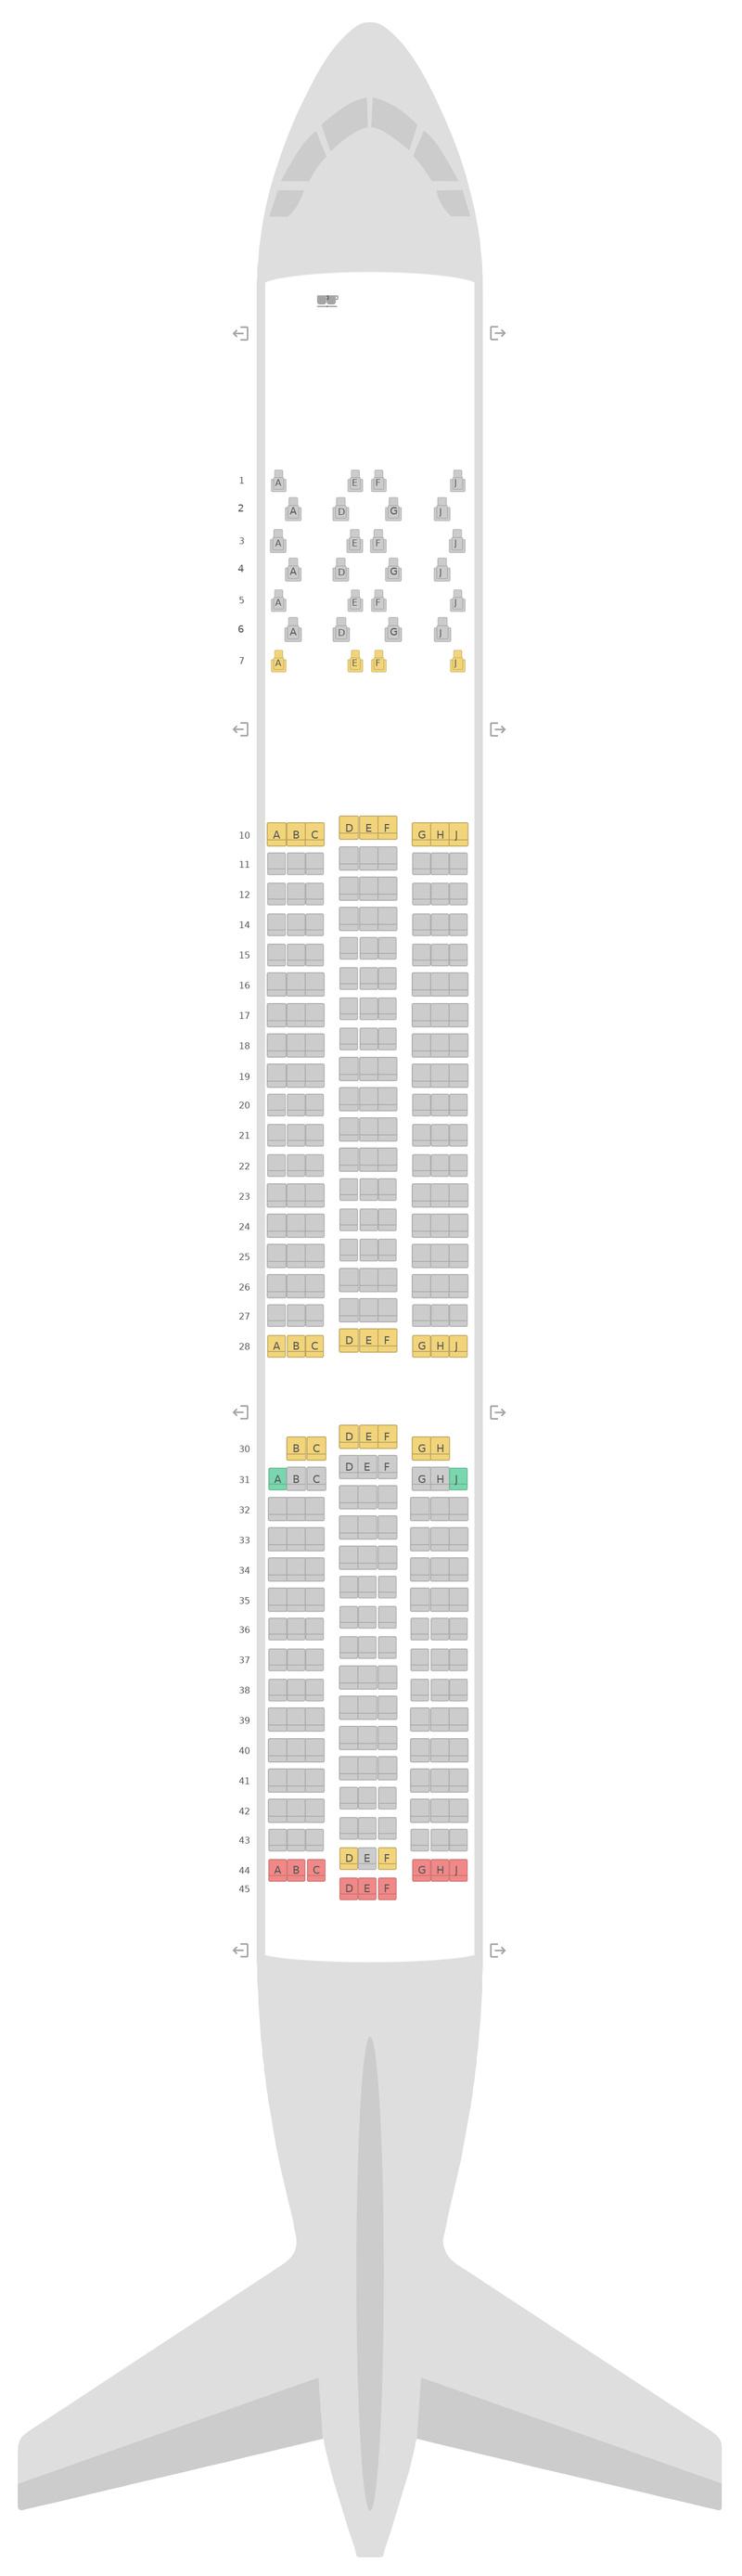 Схема салона Аэробус А350-900 (359) Эйр Маврикий